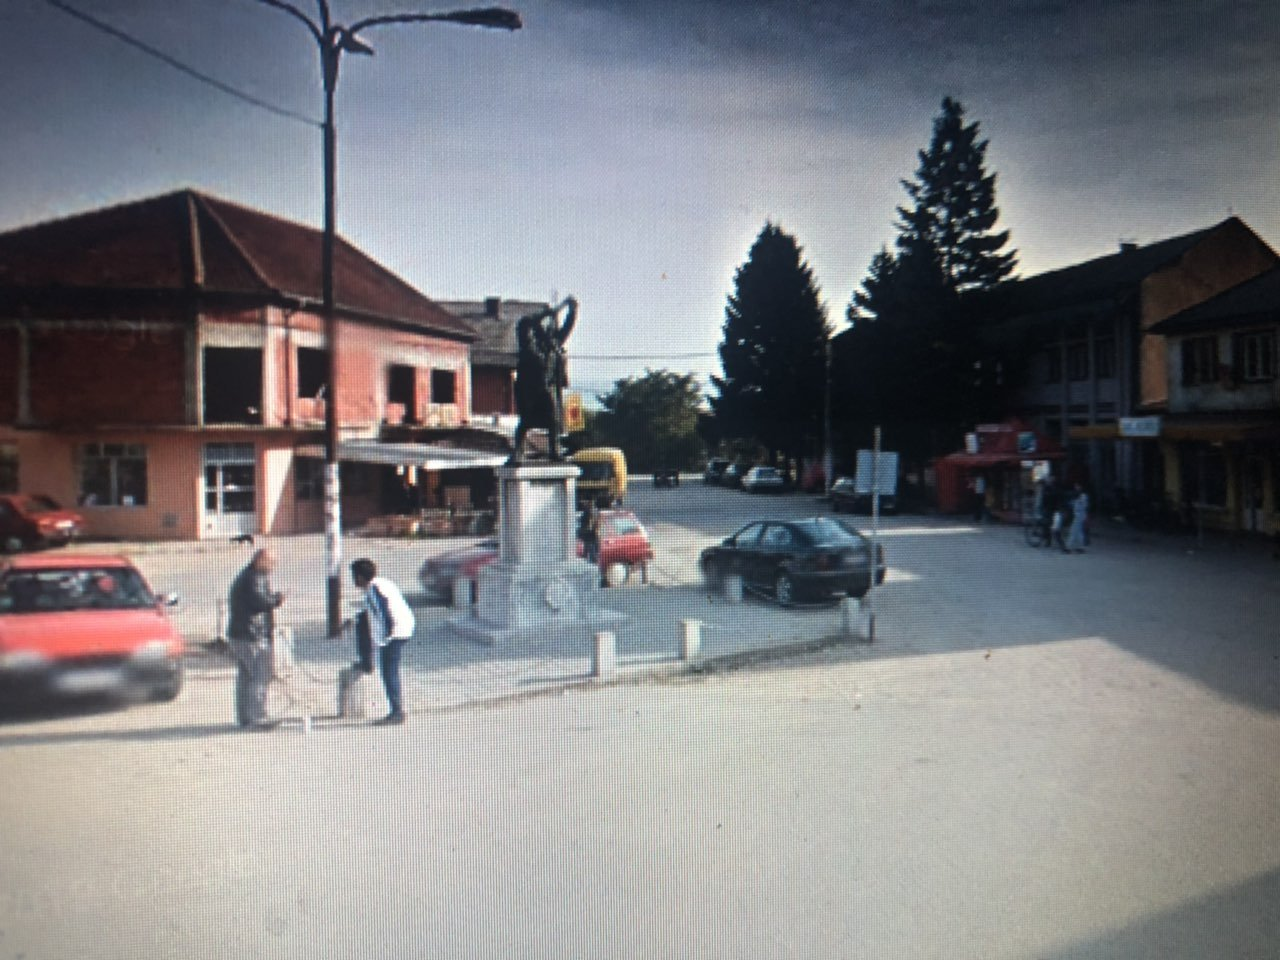 Tešica centar, foto: Google map